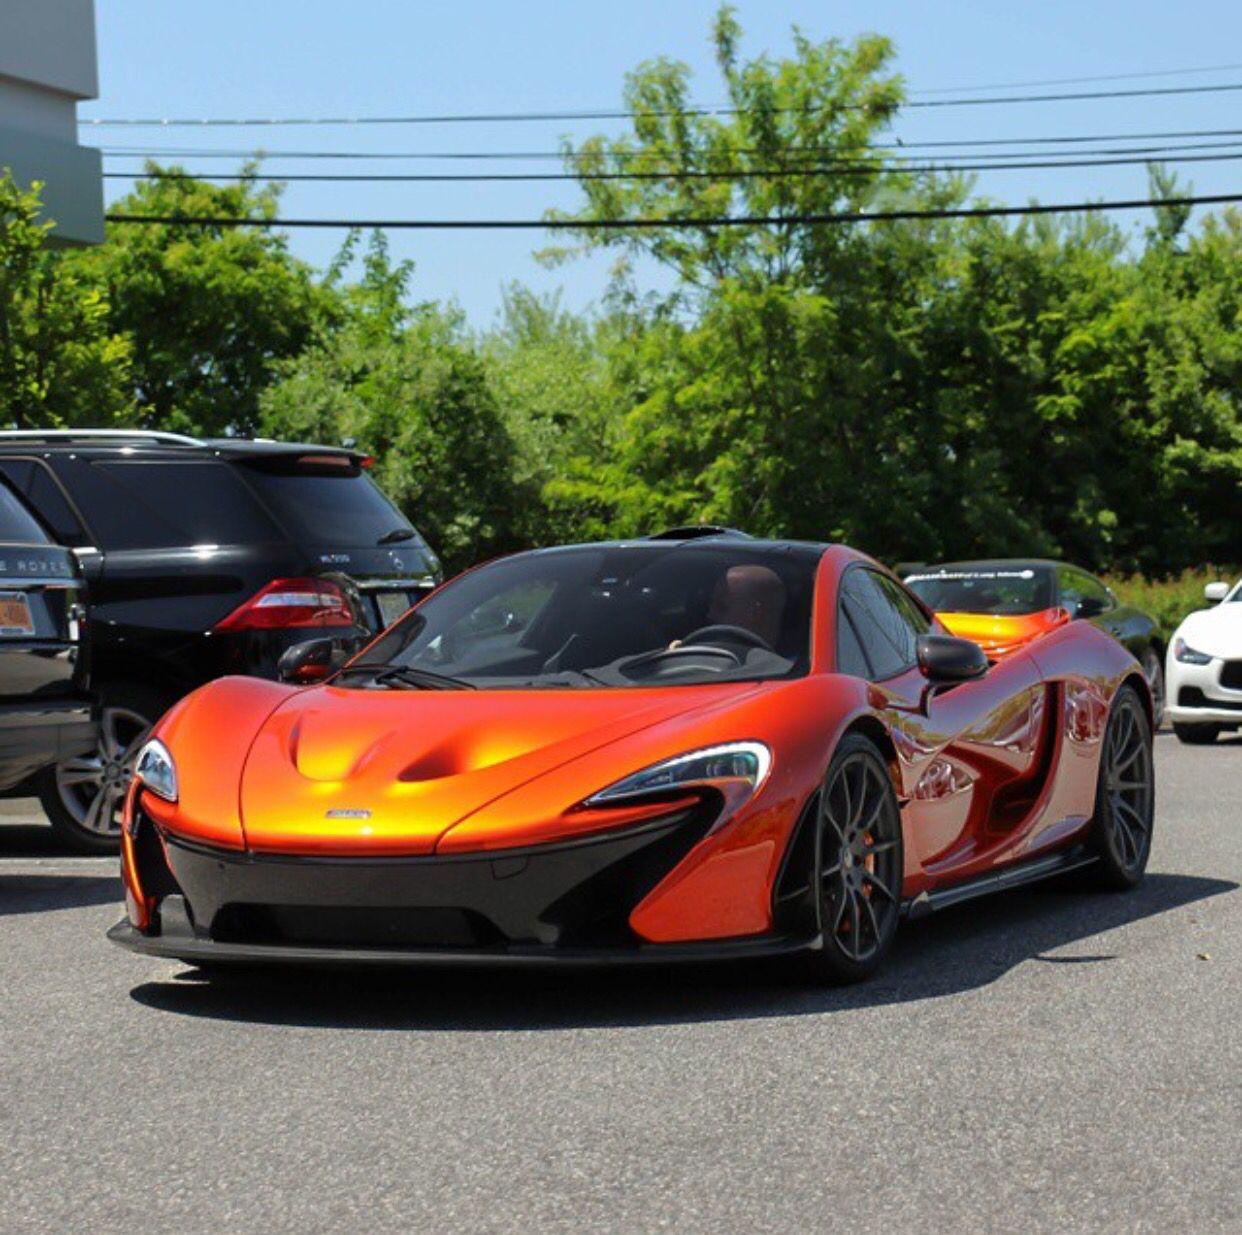 Incroyable McLaren P1 Painted In Volcano Orange Photo Taken By: @northeastmotorcars On  Instagram